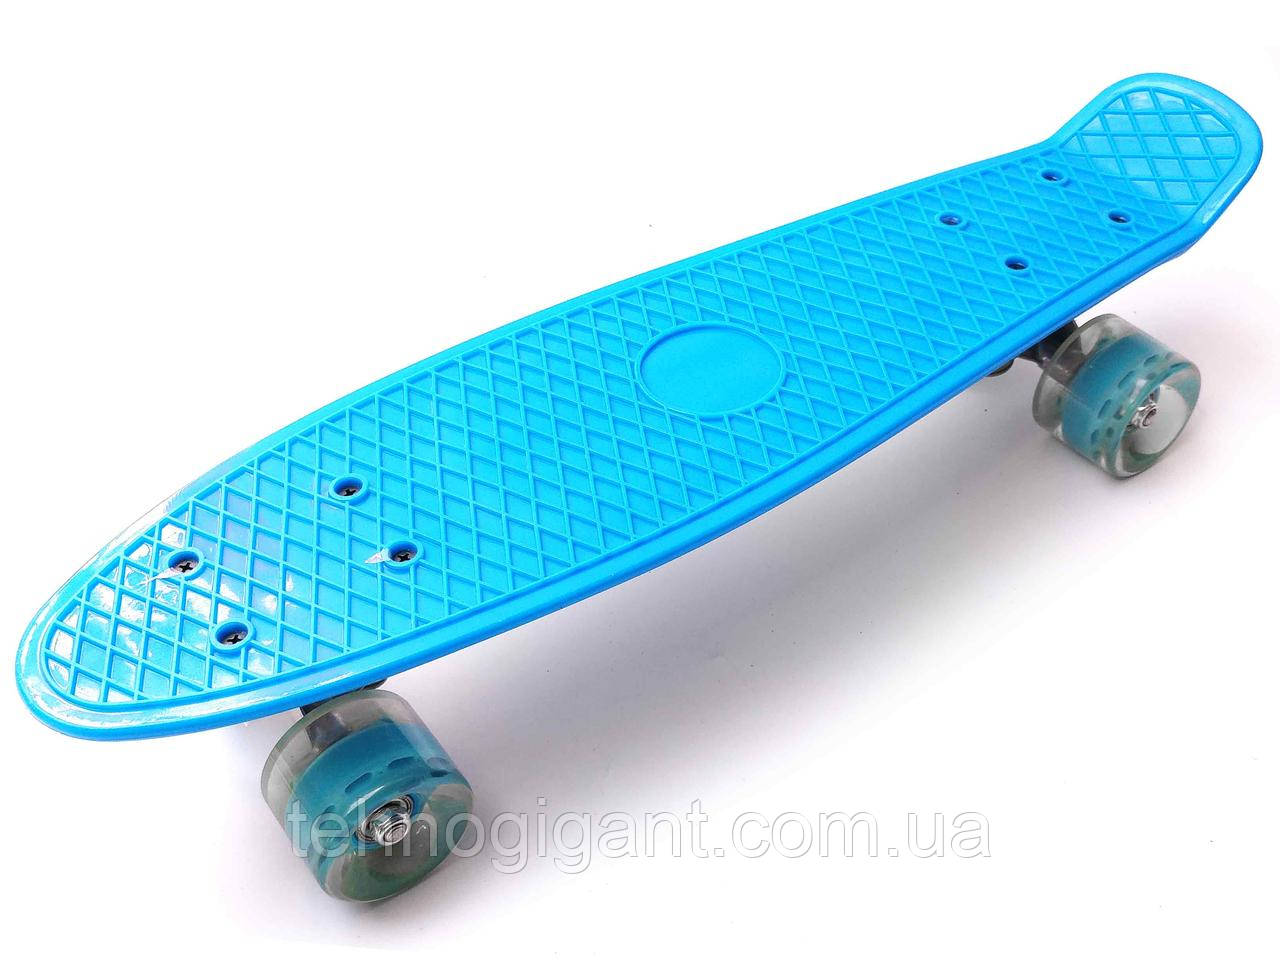 Скейт Penny Board, с широкими светящимися колесами Пенни борд, детский , от 4 лет, Цвет Голубой